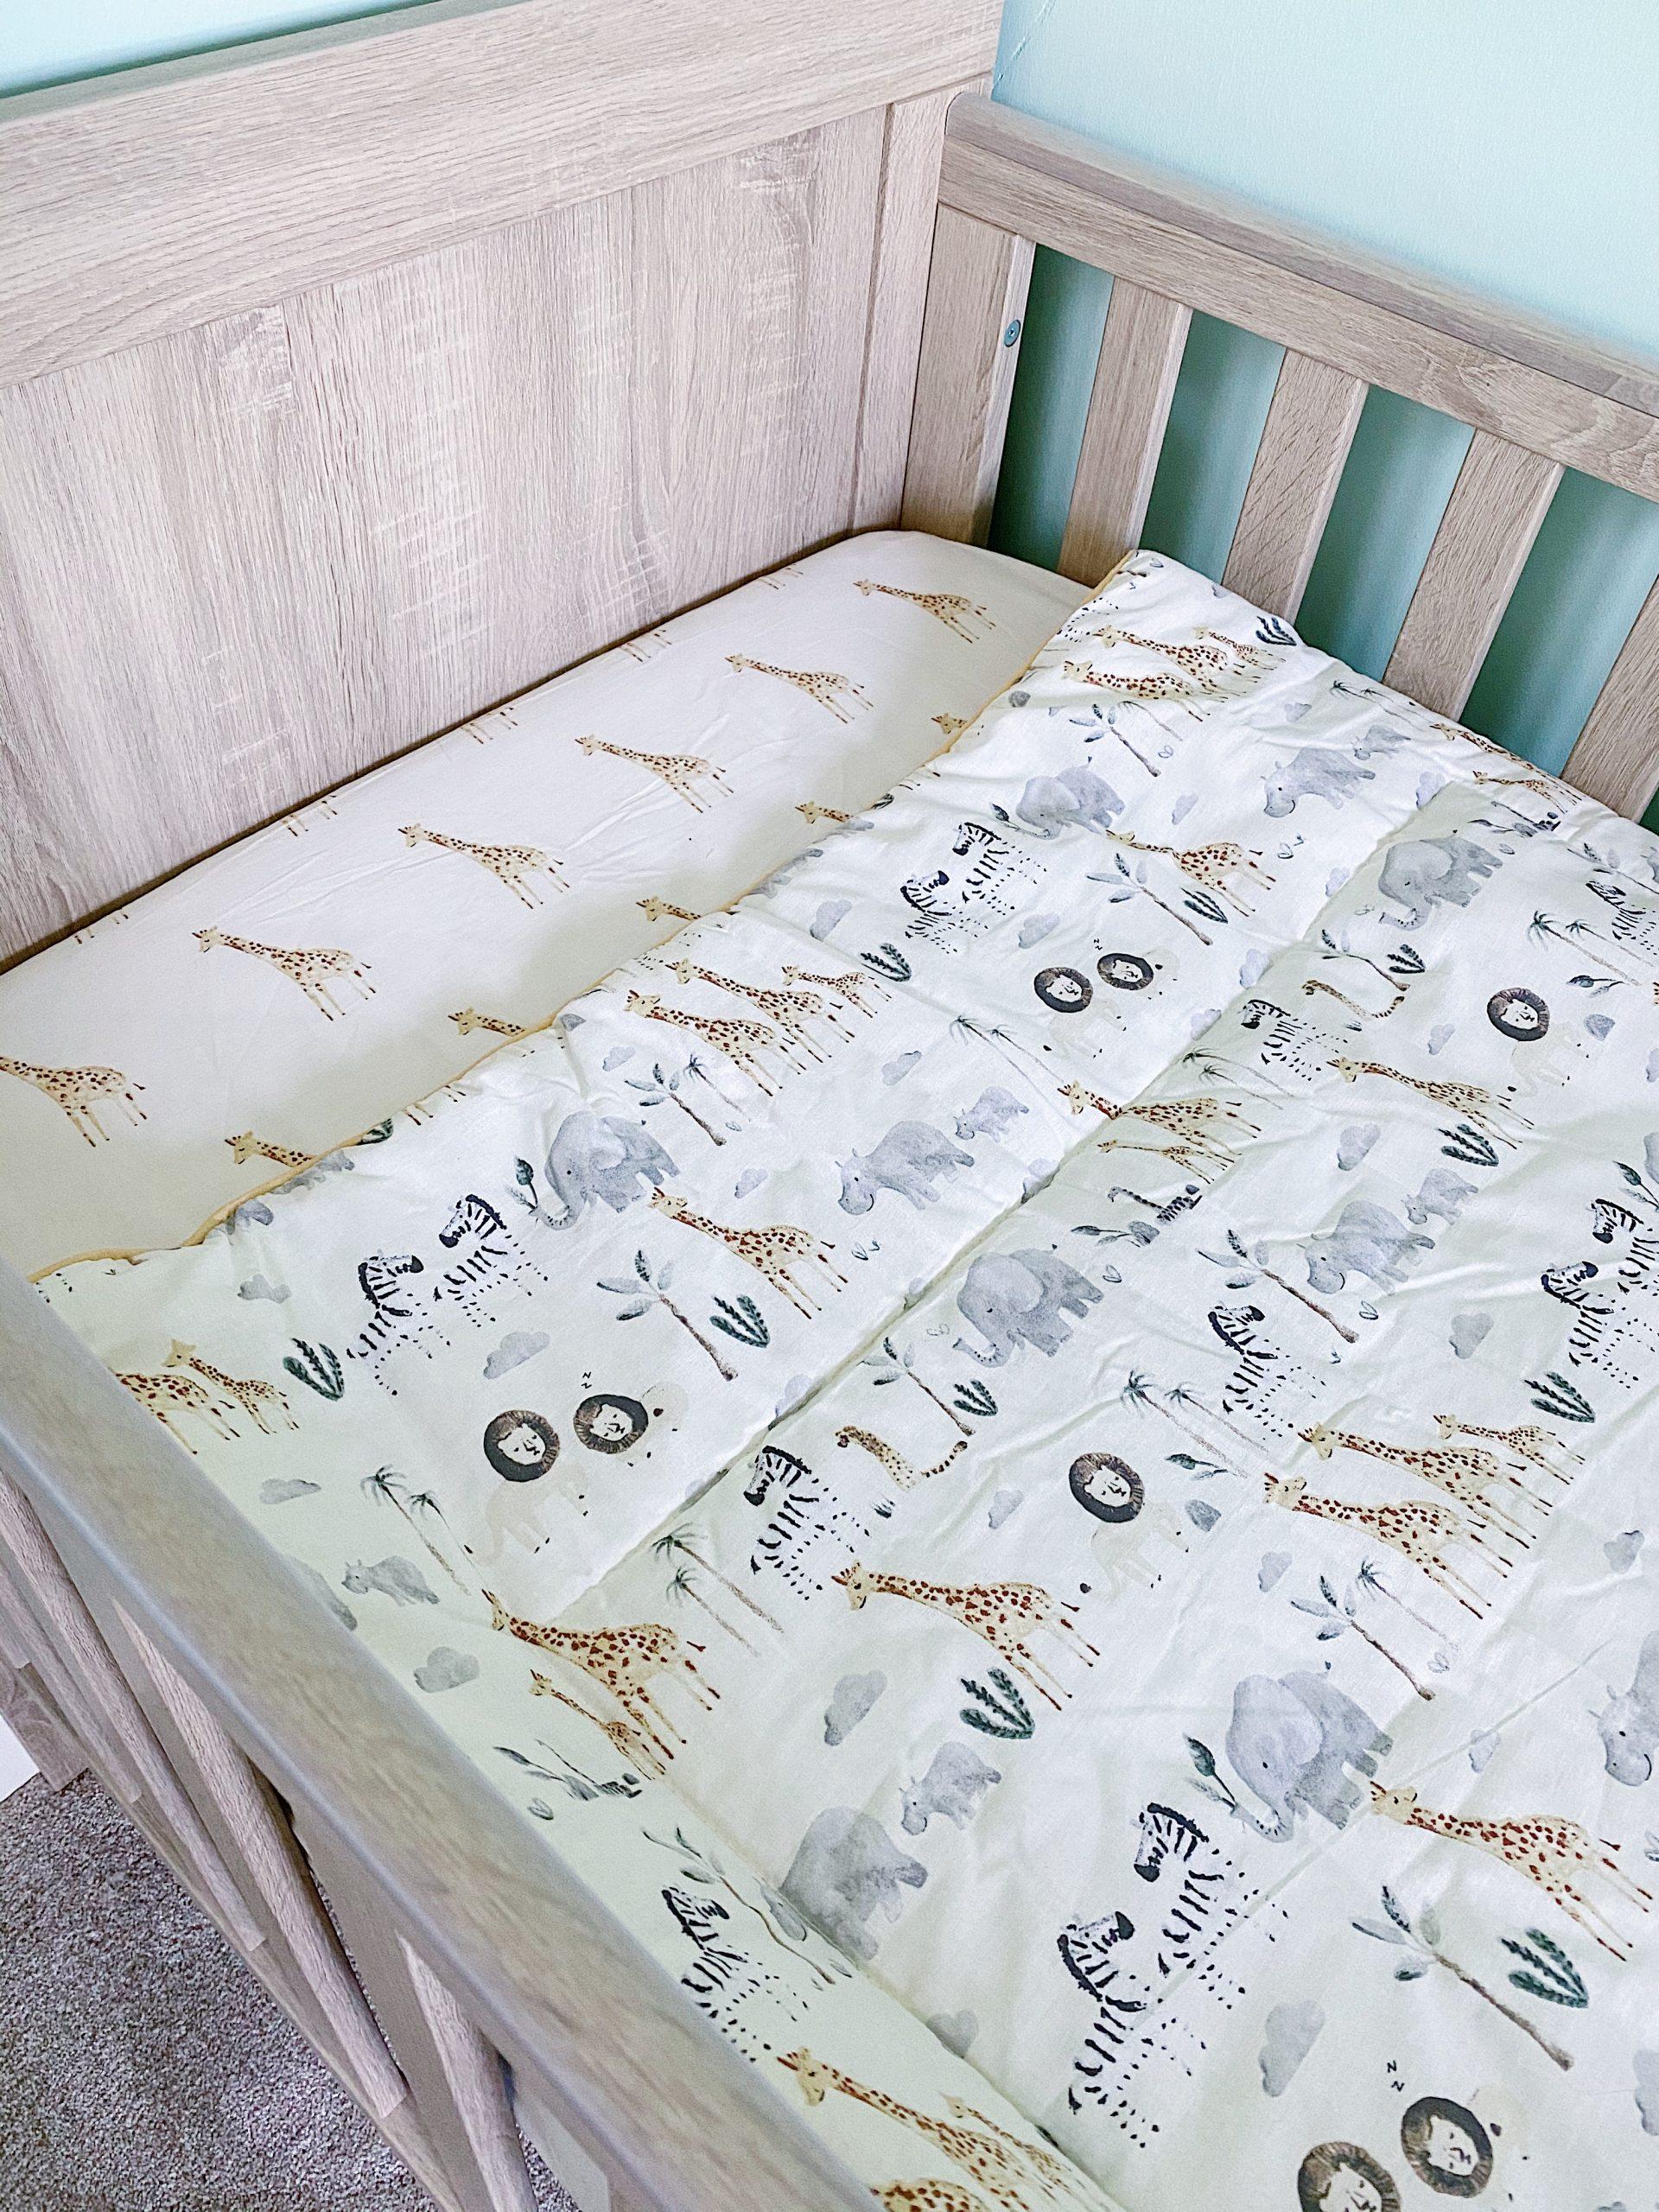 Our Baby's Nursery - Safari Theme cot bedding